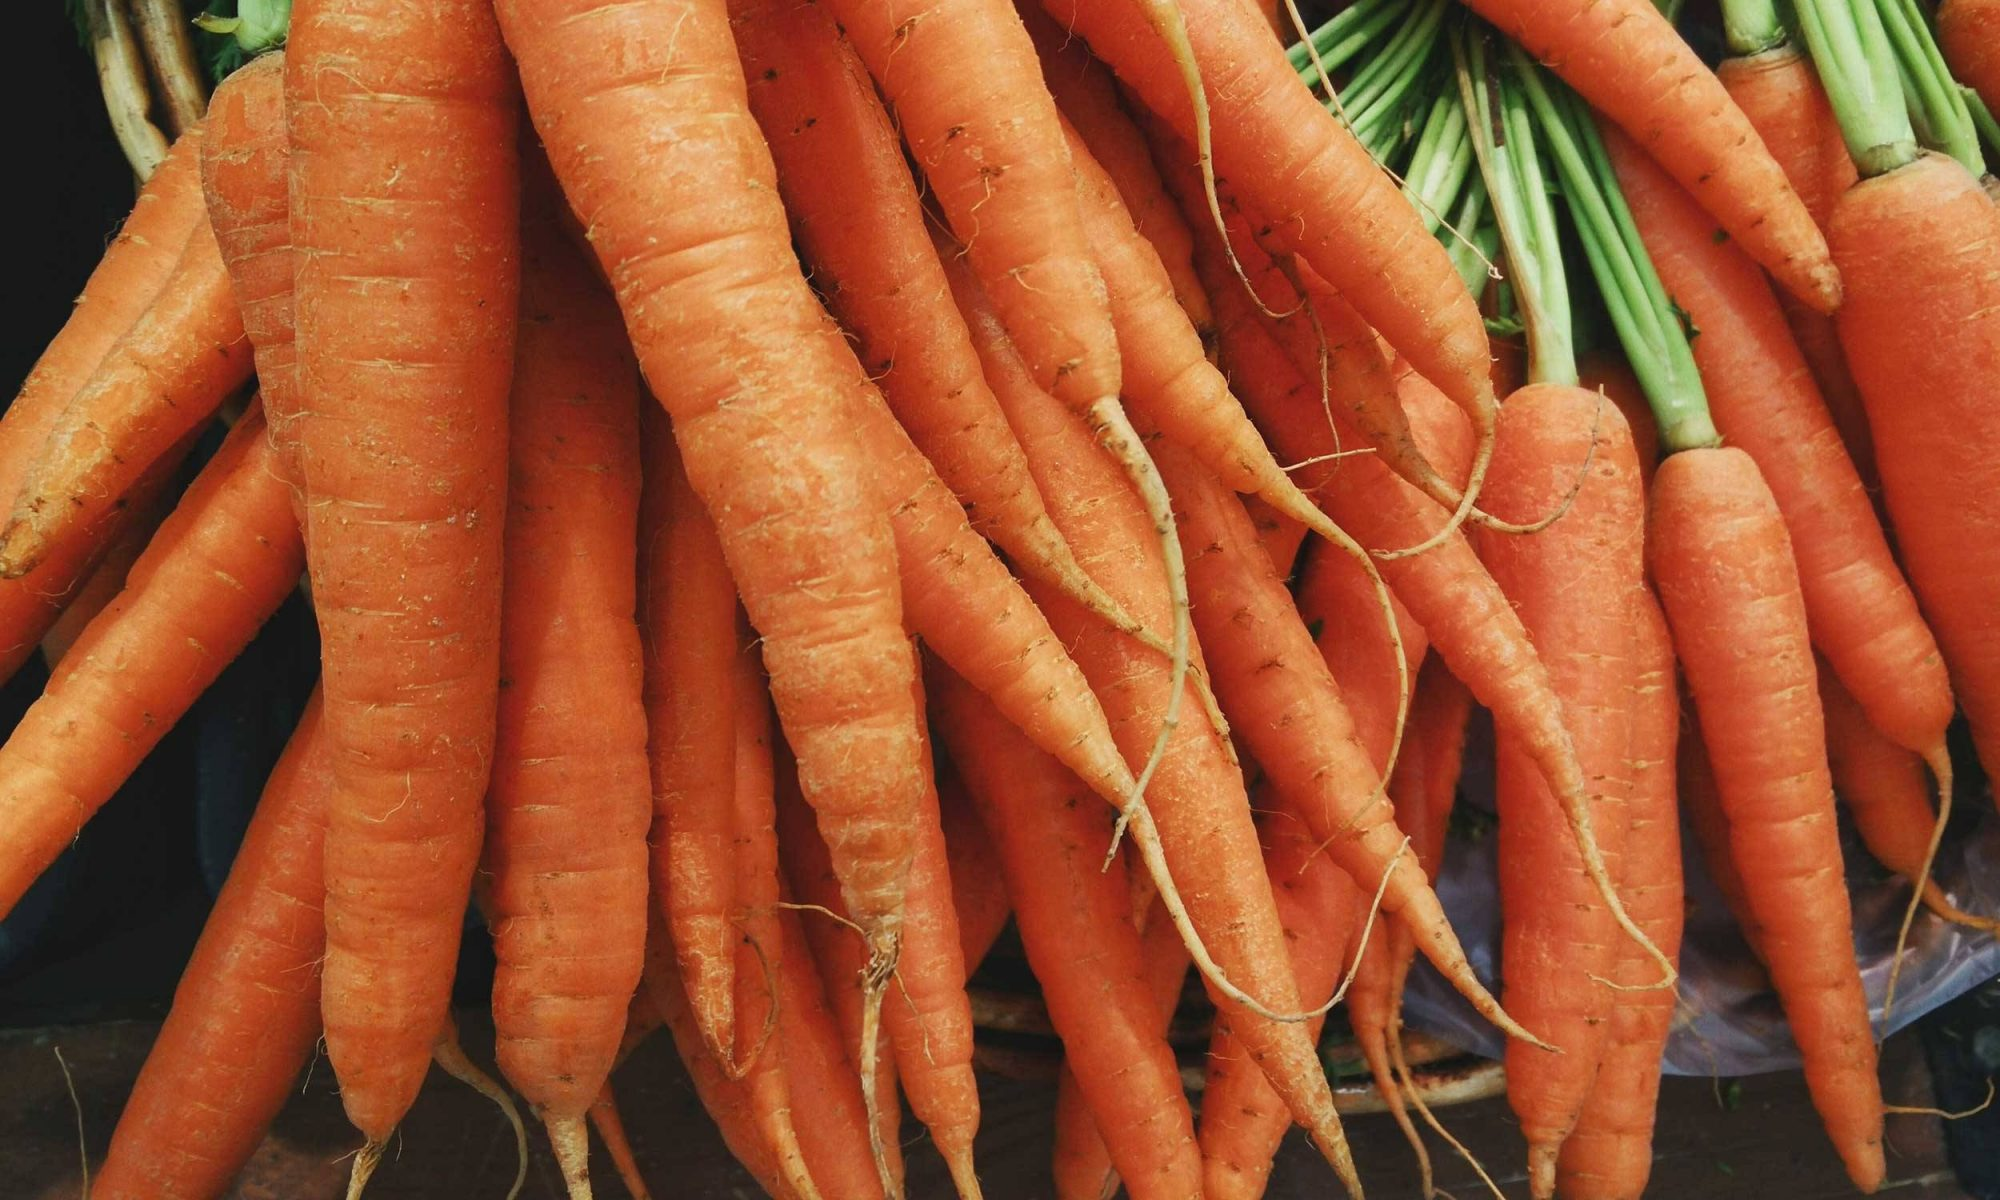 Bunch of fresh, raw carrots